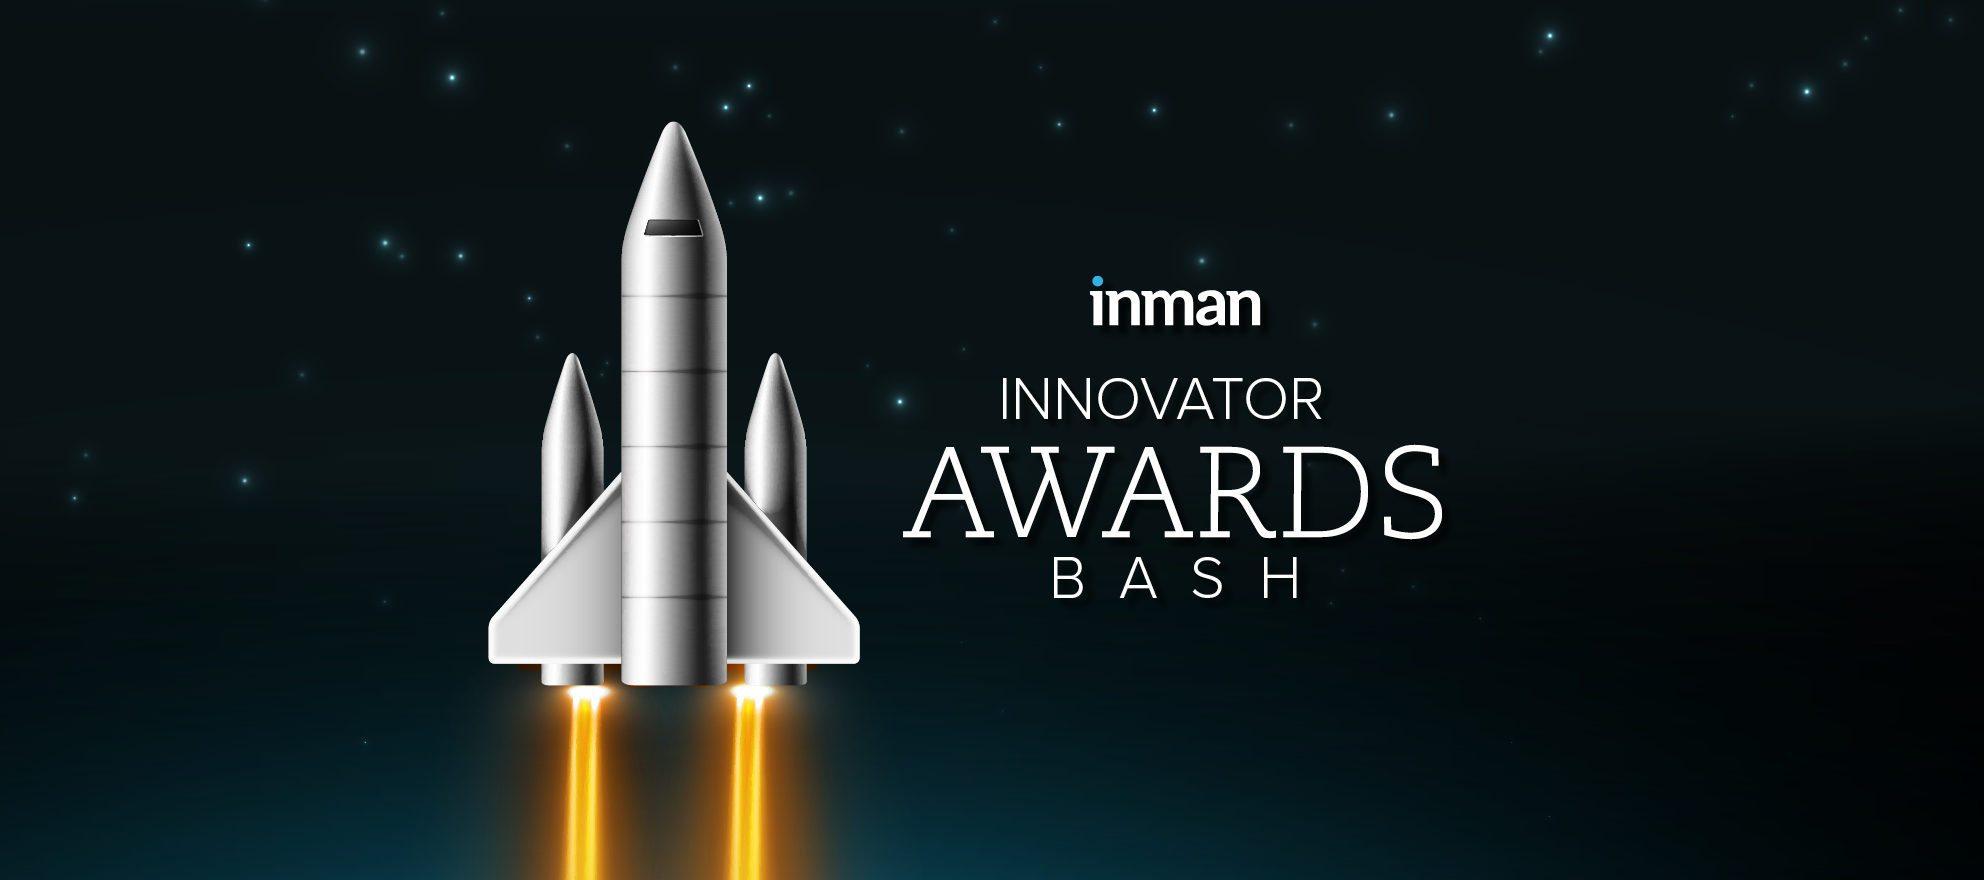 innovator bash